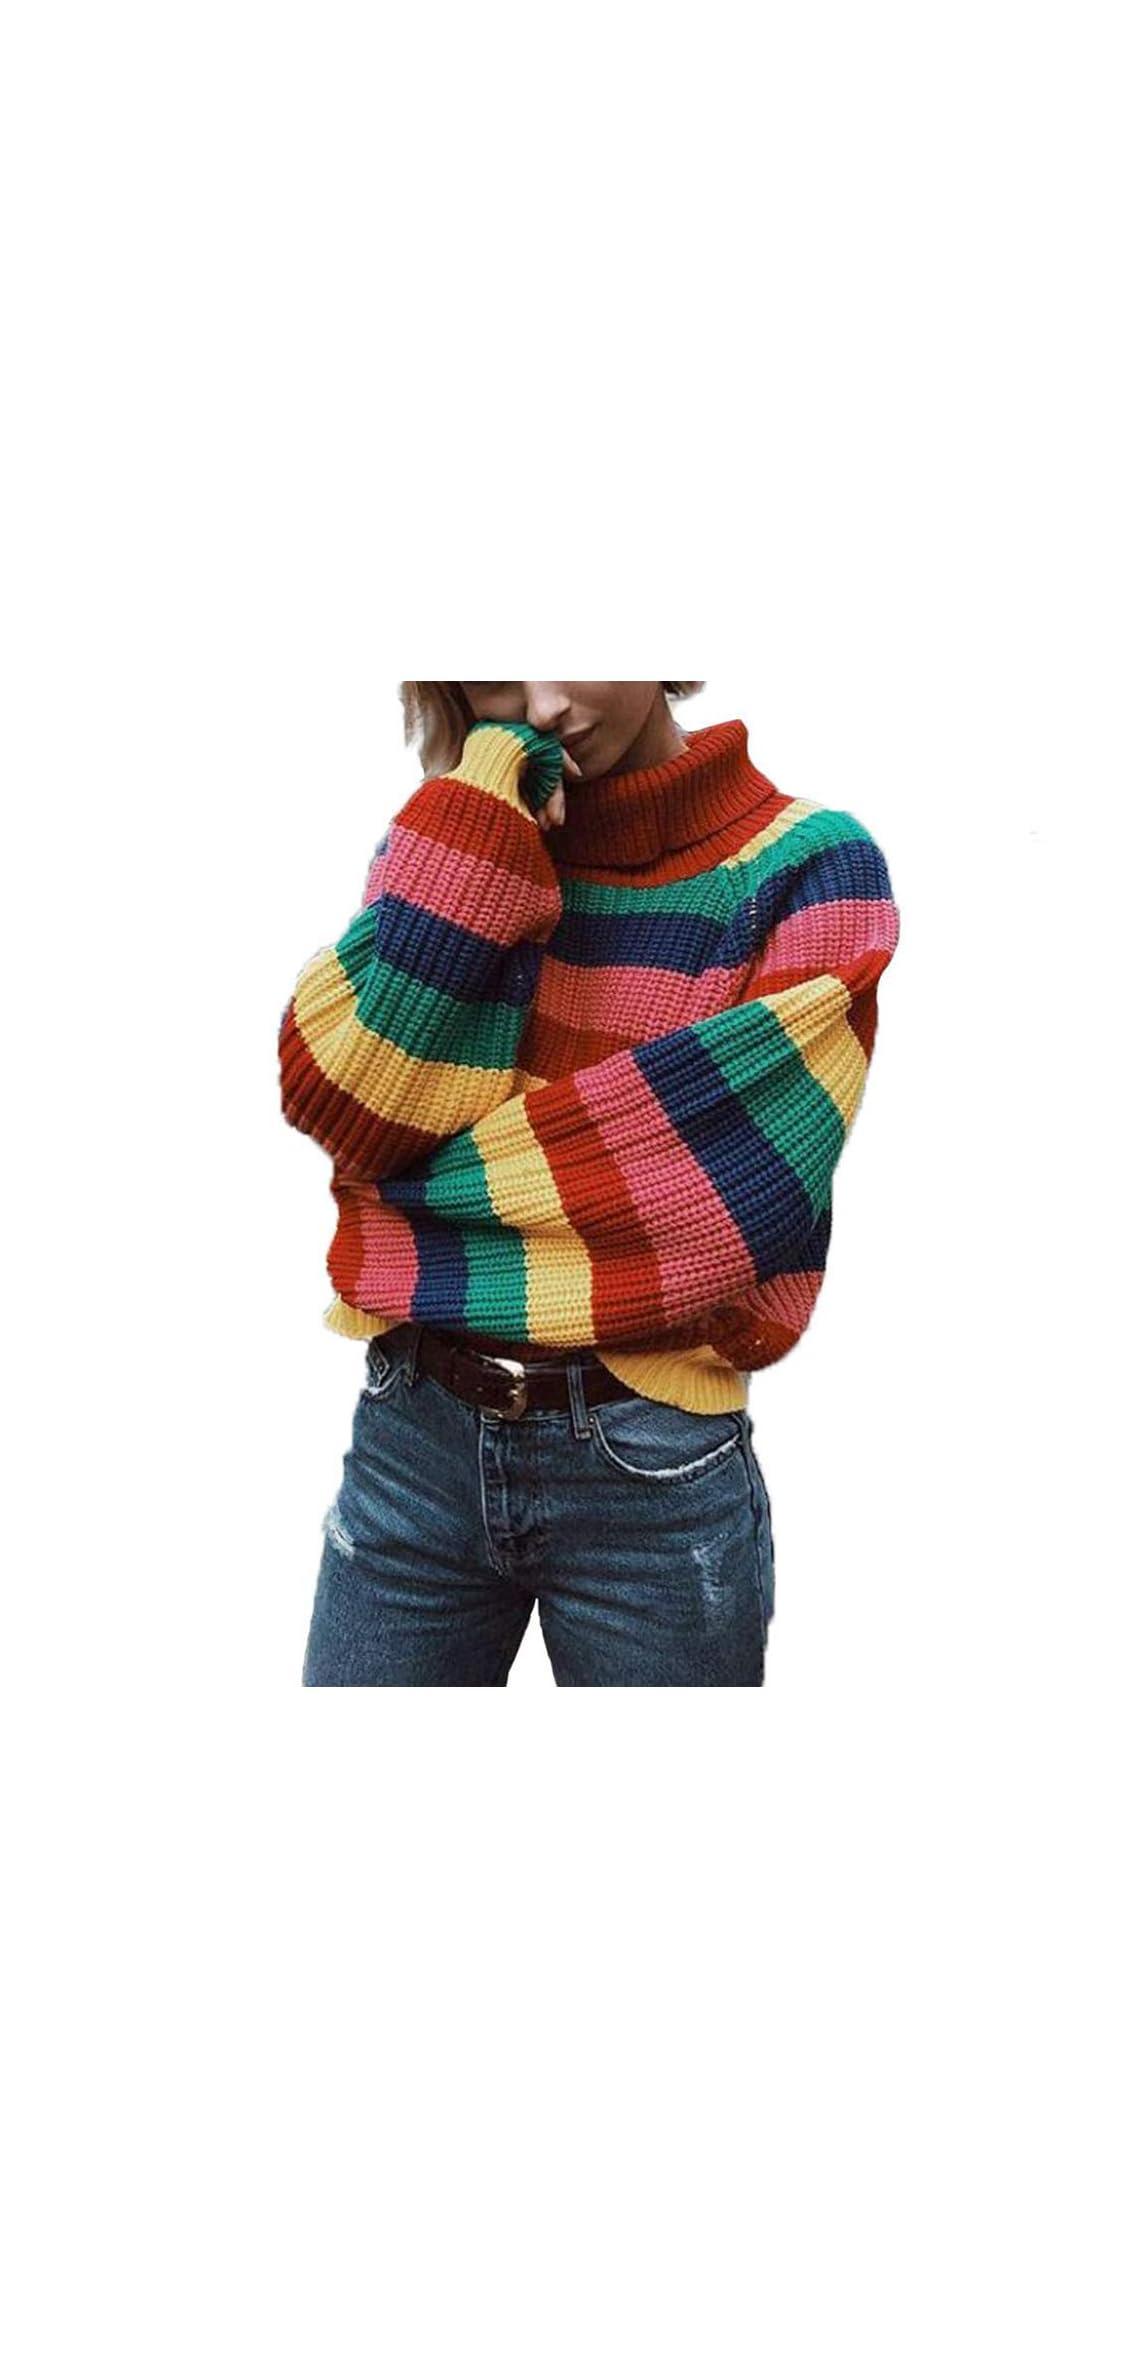 Womens Long Sleeve Striped Rainbow Striped Top Turtleneck Jumper